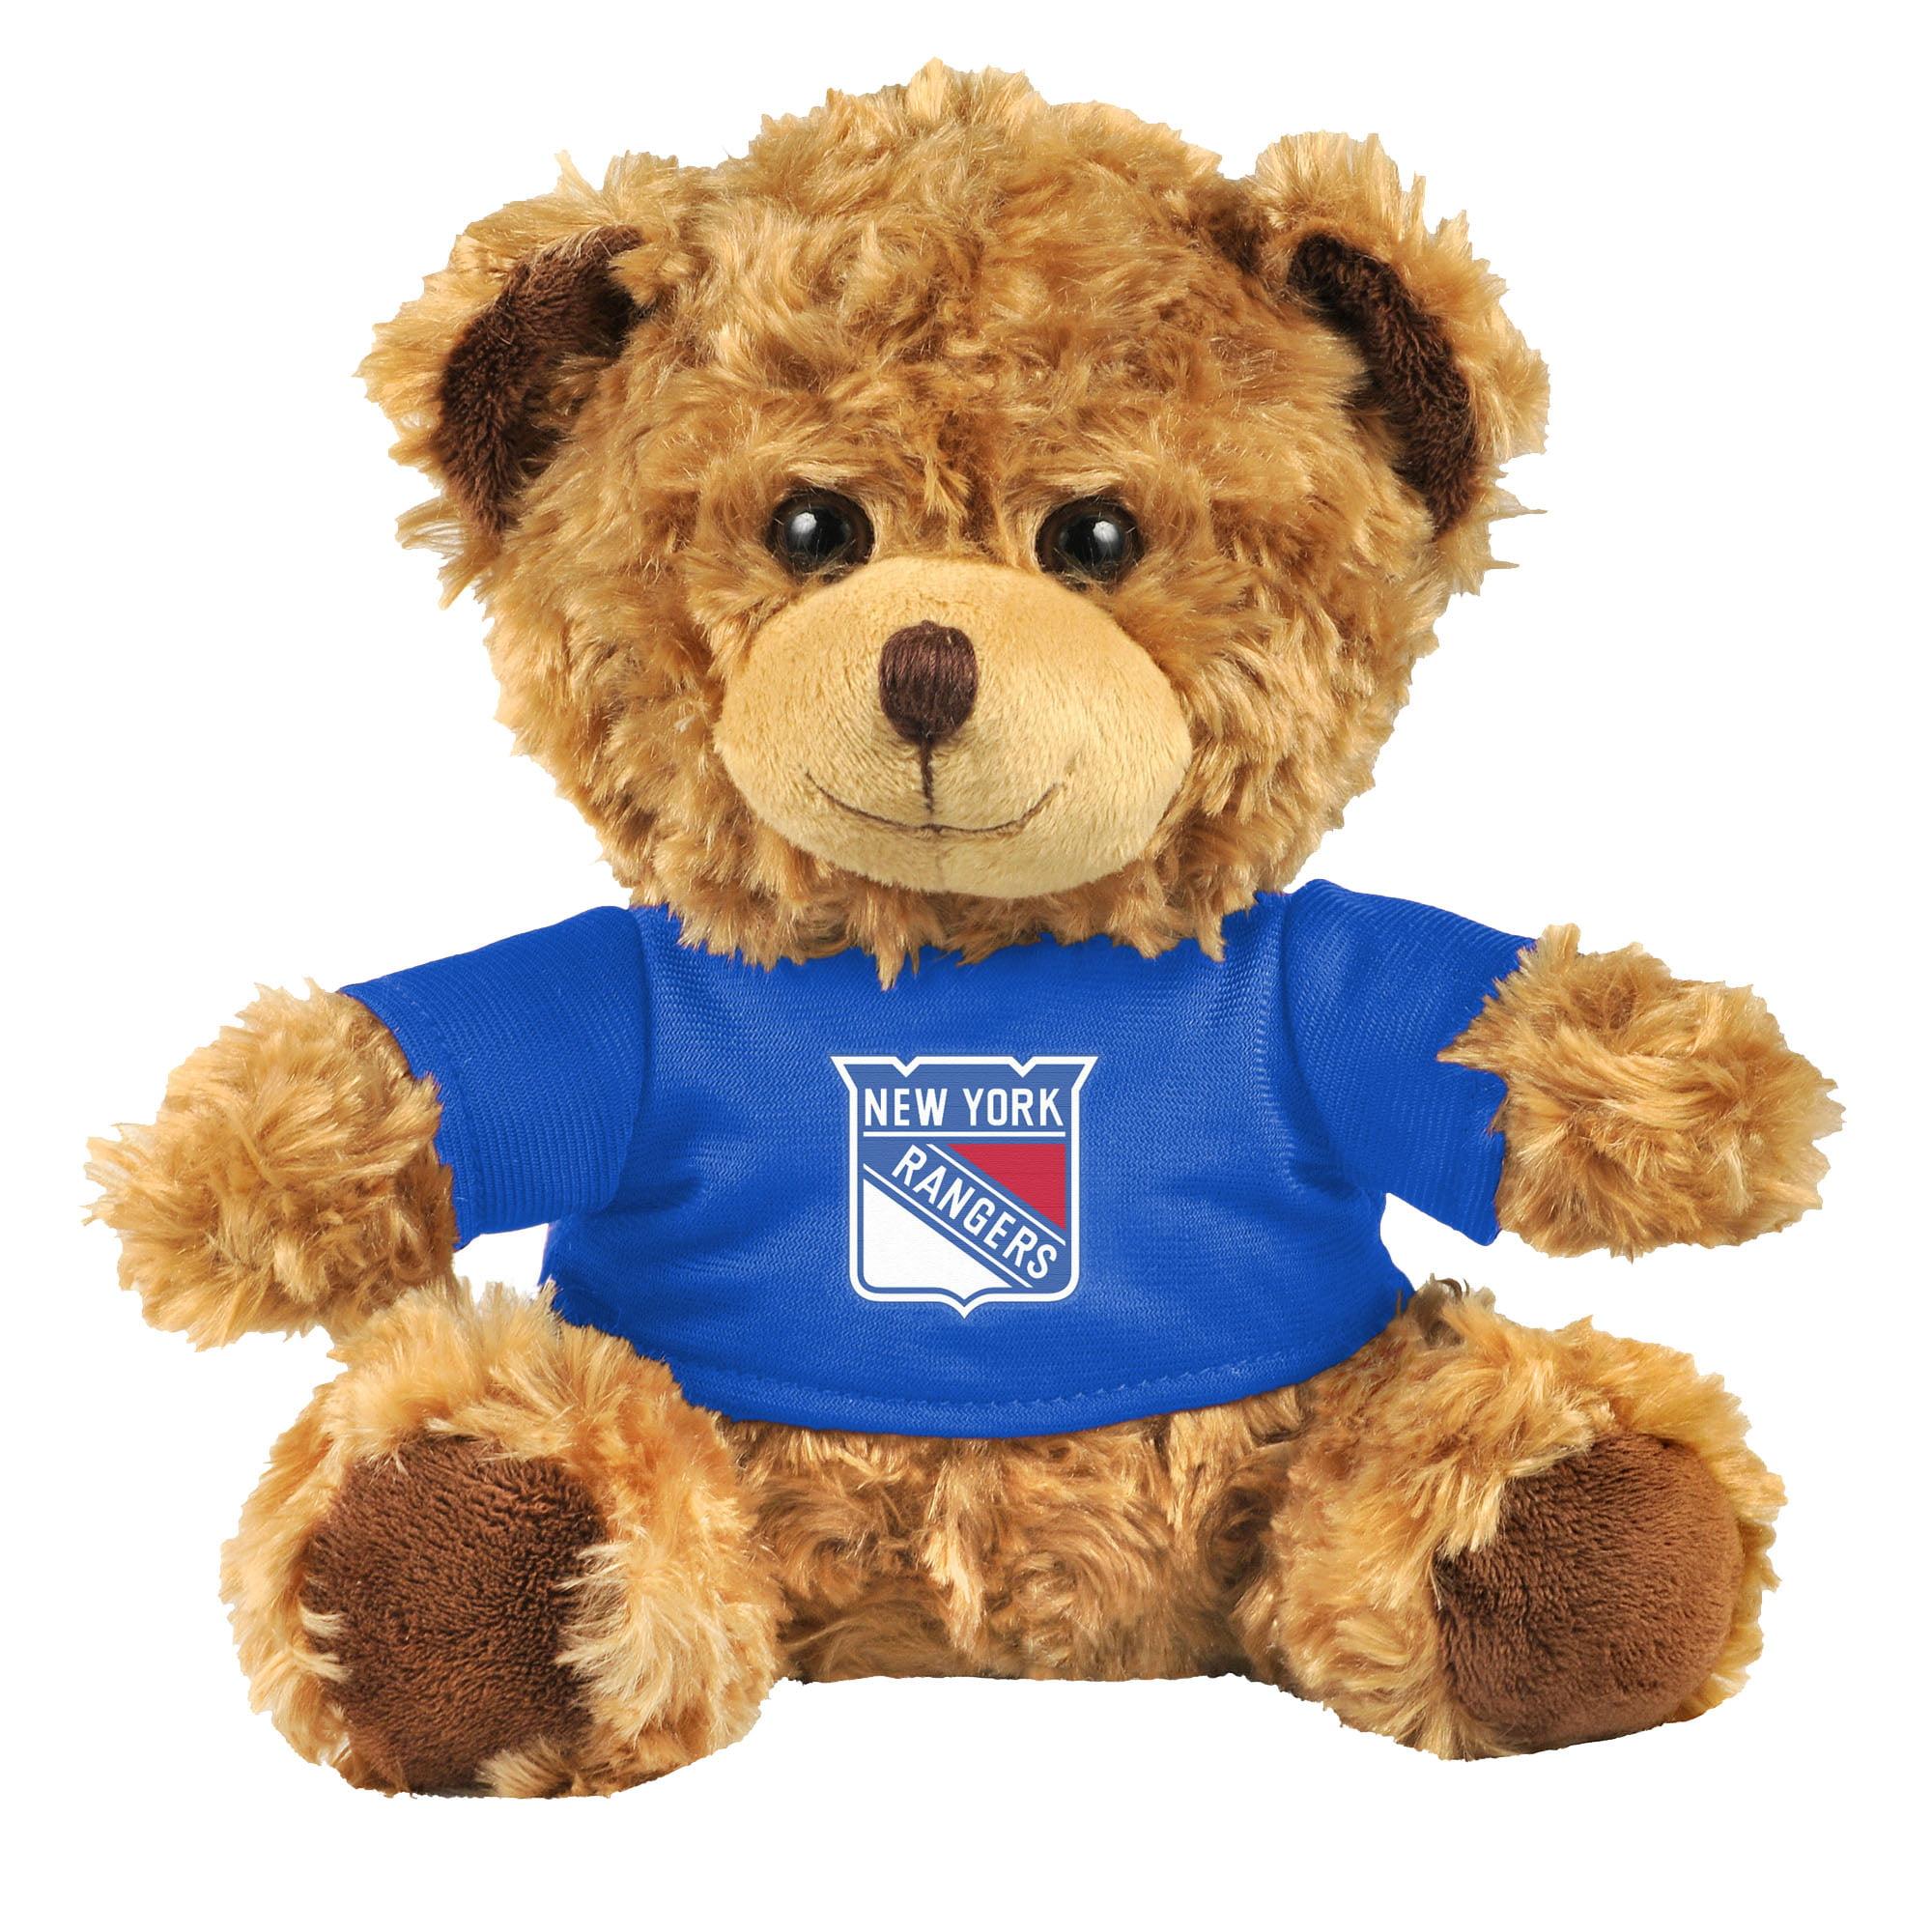 Texas Rangers Team Shirt Bear - No Size